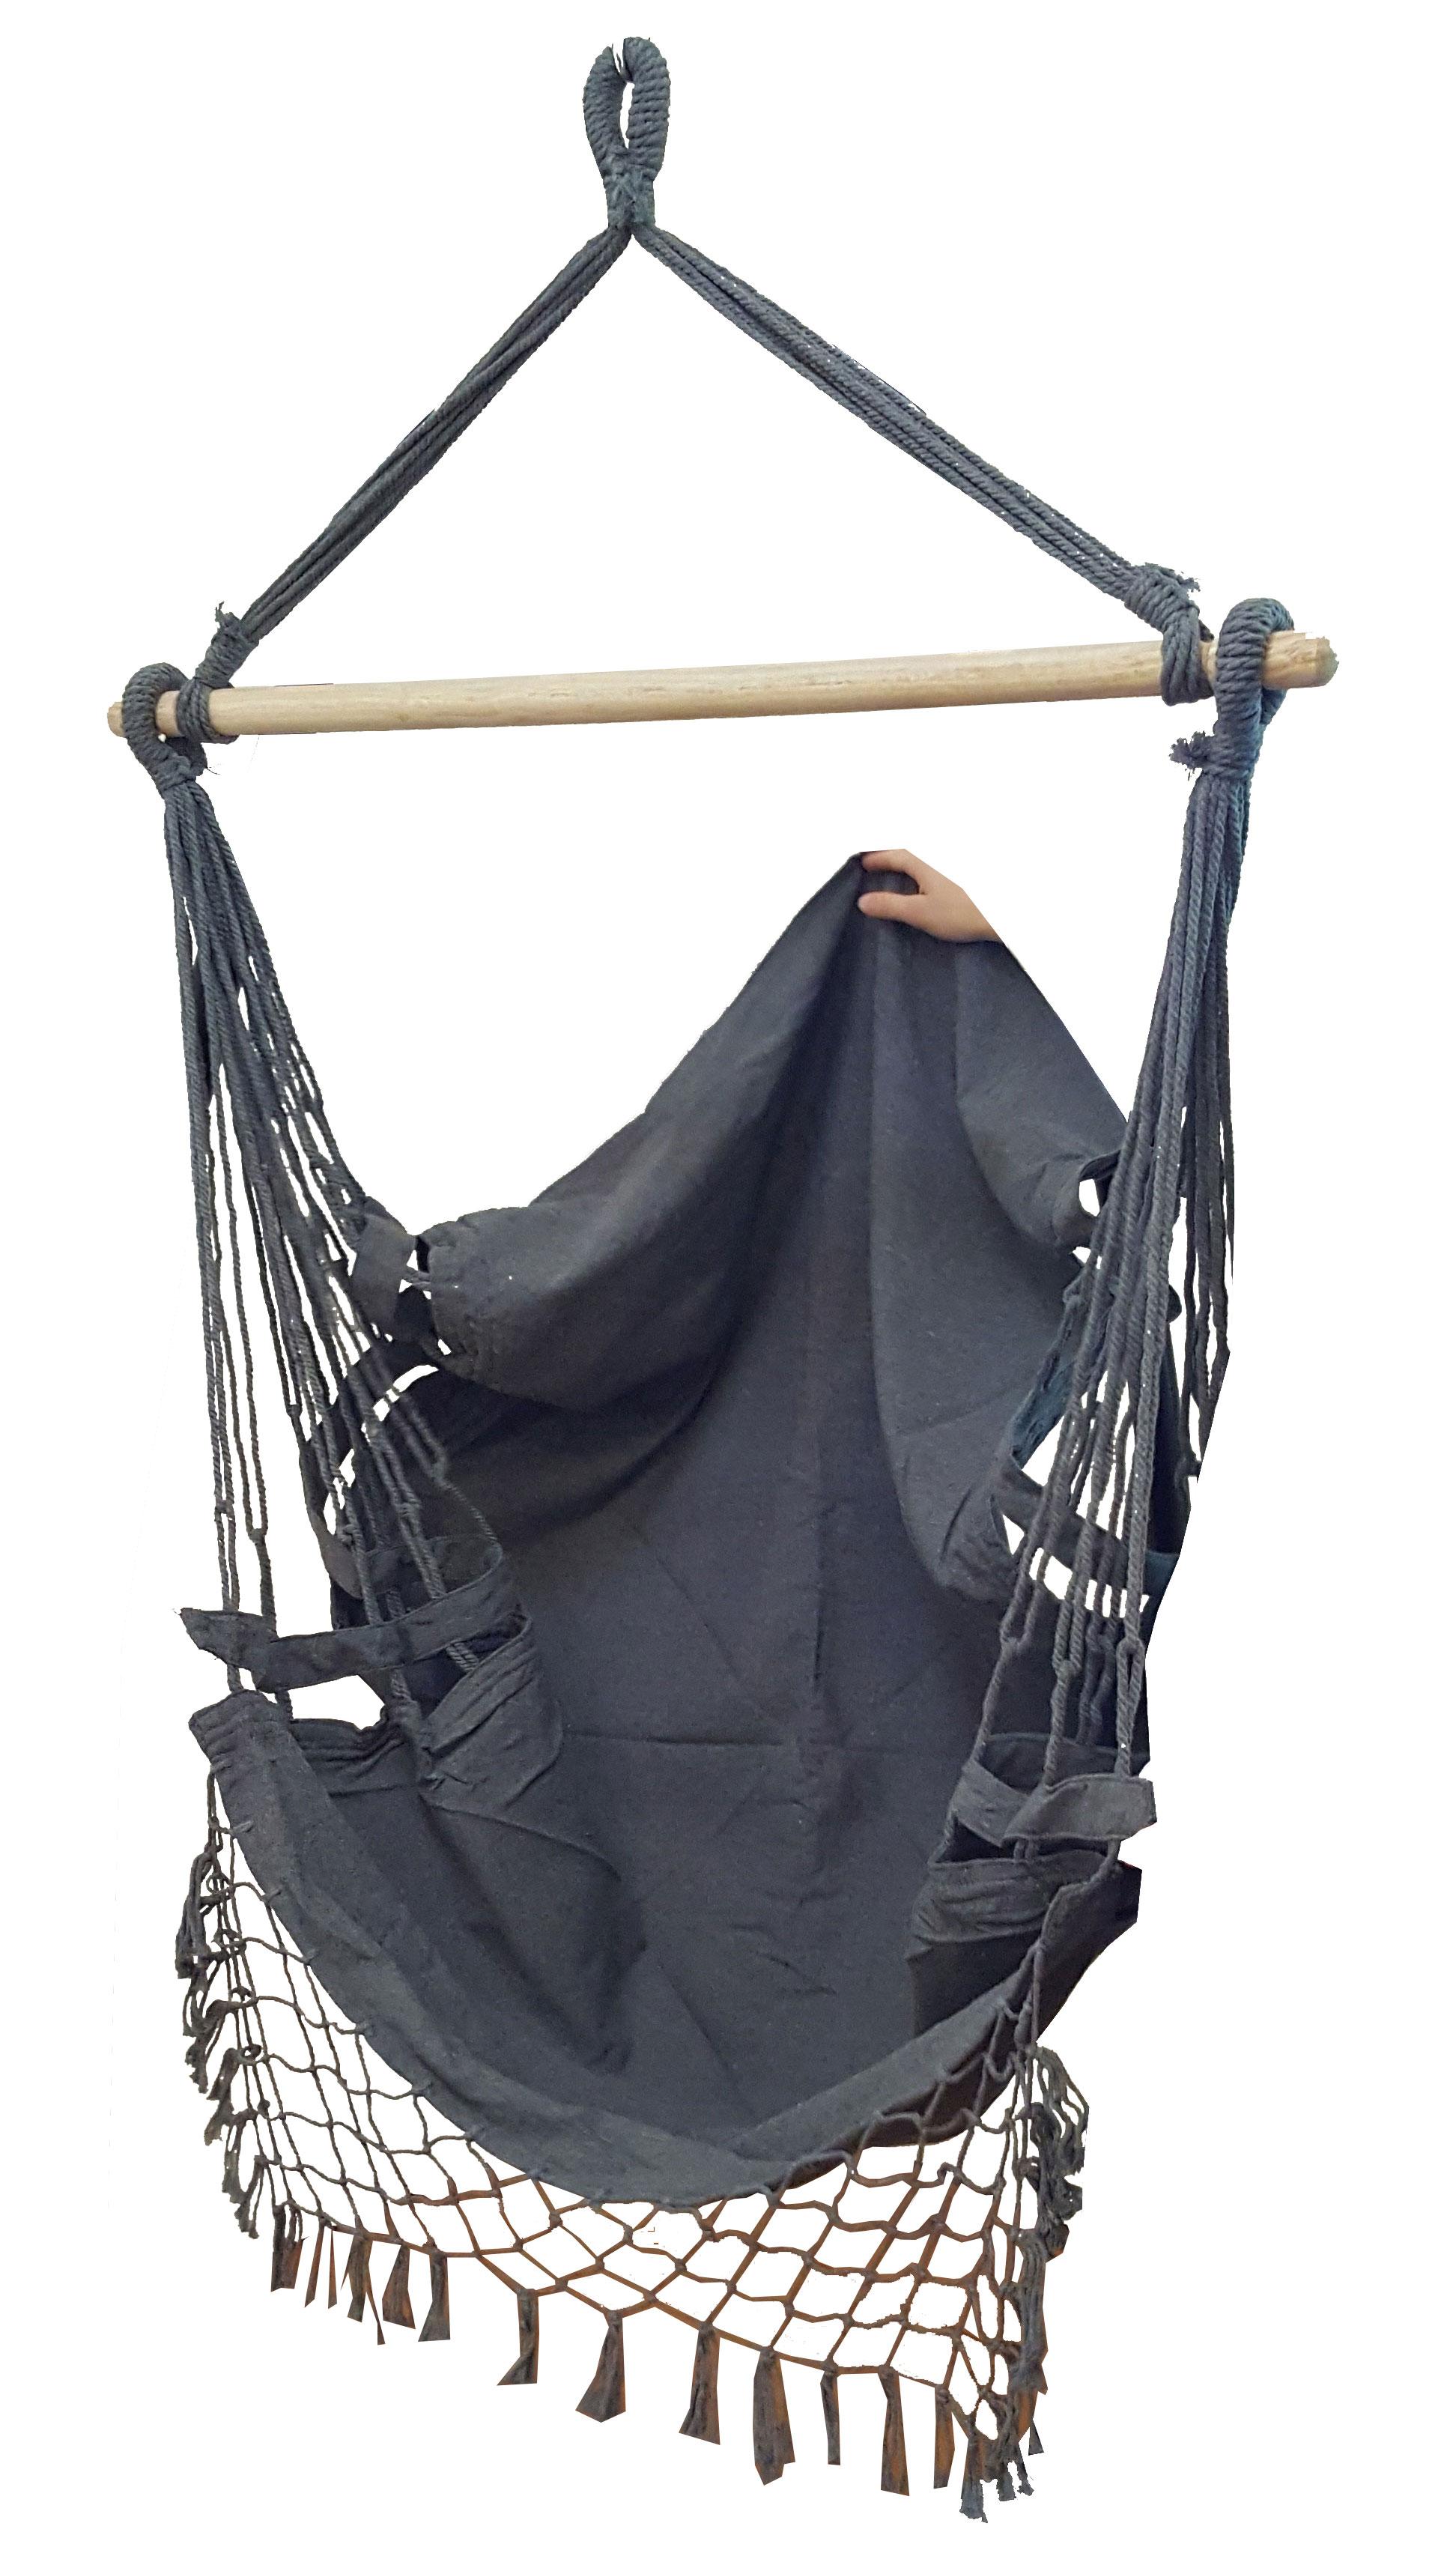 Black Canvas Hammock Chair With Tassels